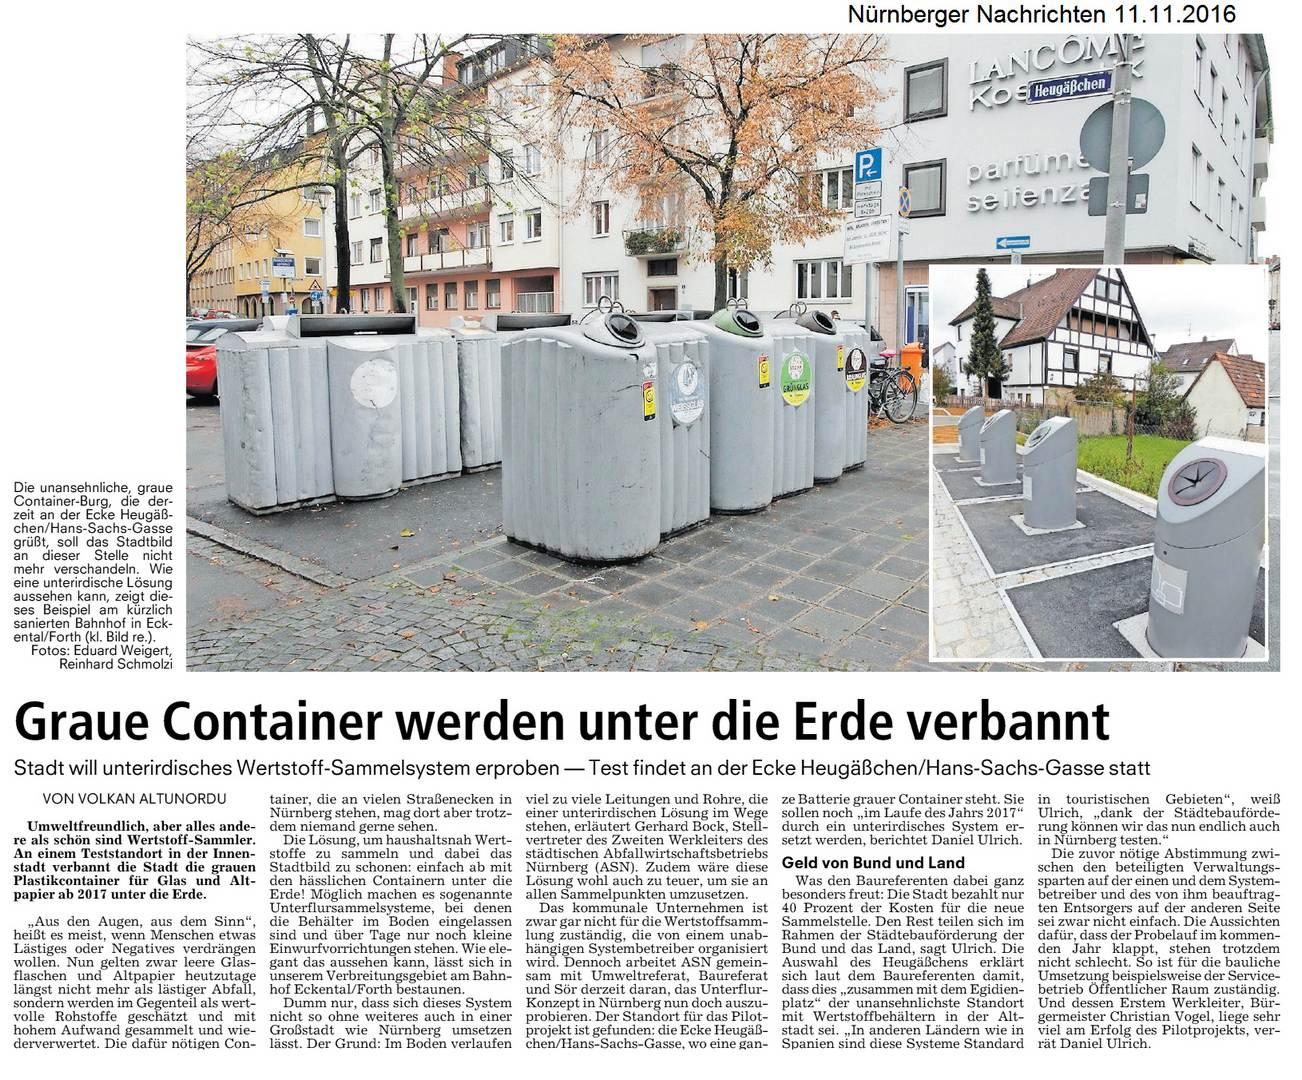 graue-container-unter-die-erde